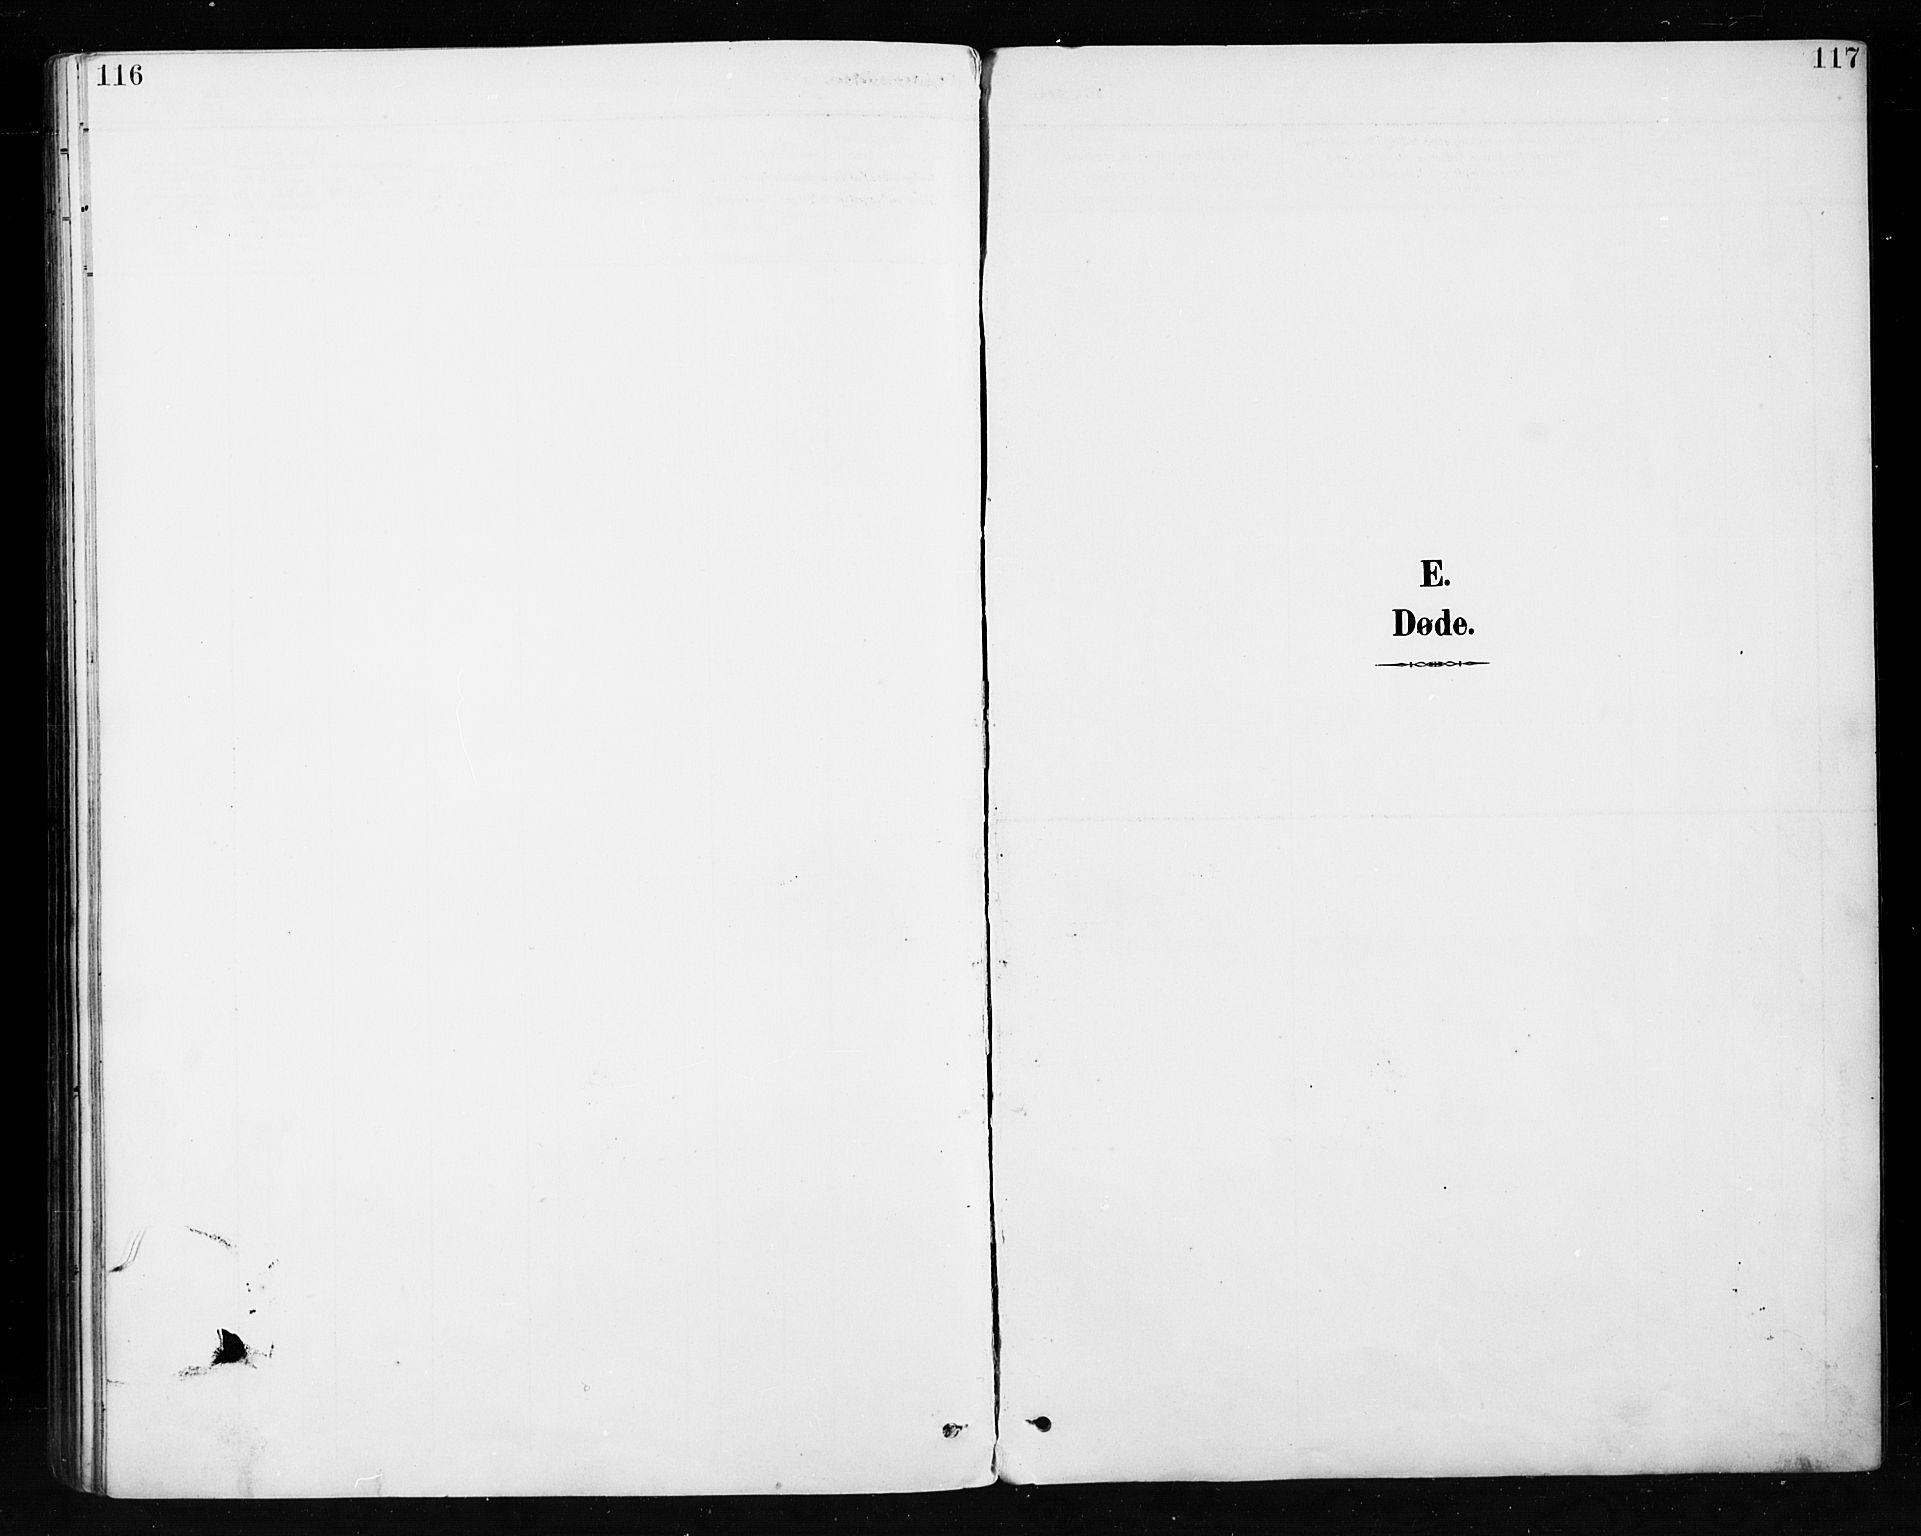 SAH, Etnedal prestekontor, H/Ha/Hab/Habb/L0001: Klokkerbok nr. II 1, 1894-1911, s. 116-117